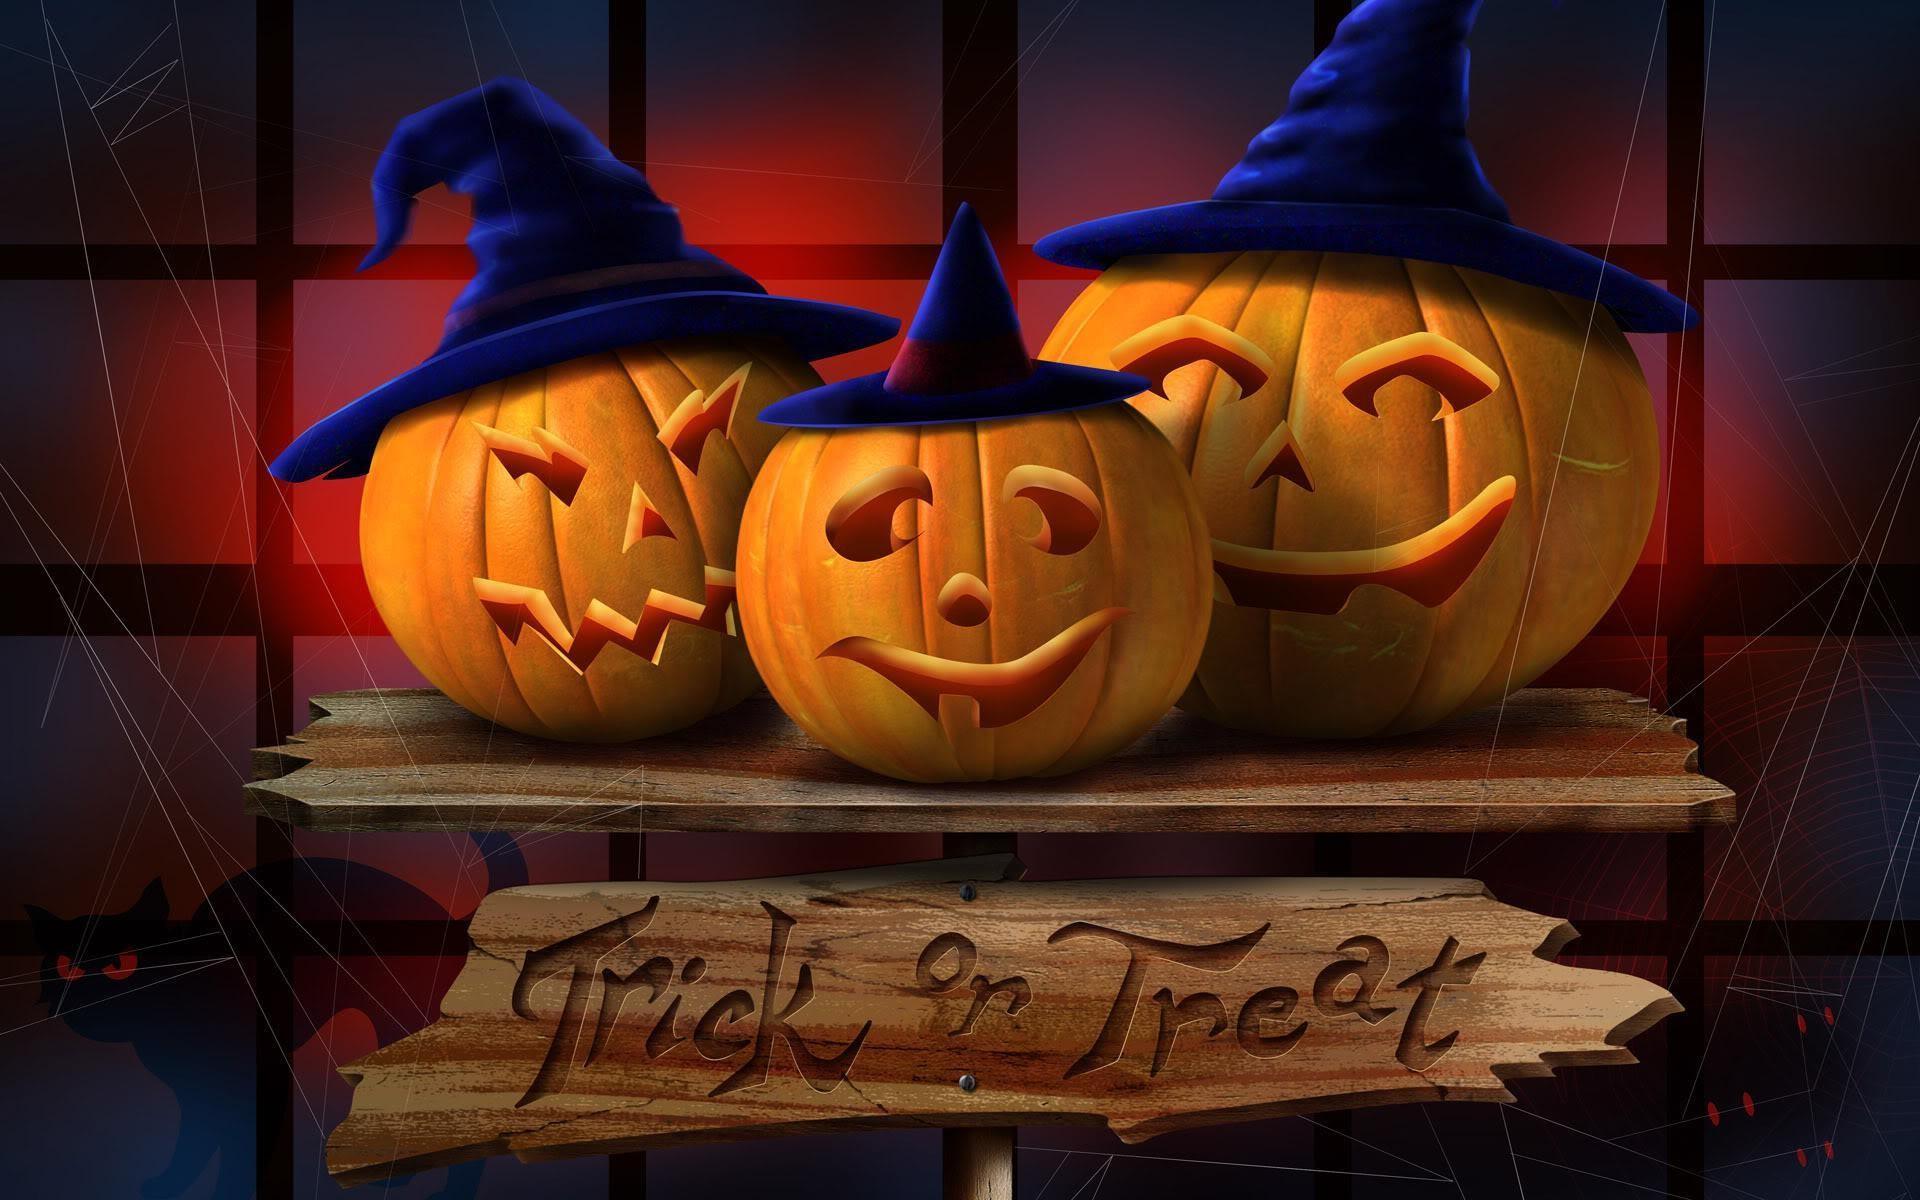 Live Halloween Wallpaper for Desktop 62 images 1920x1200